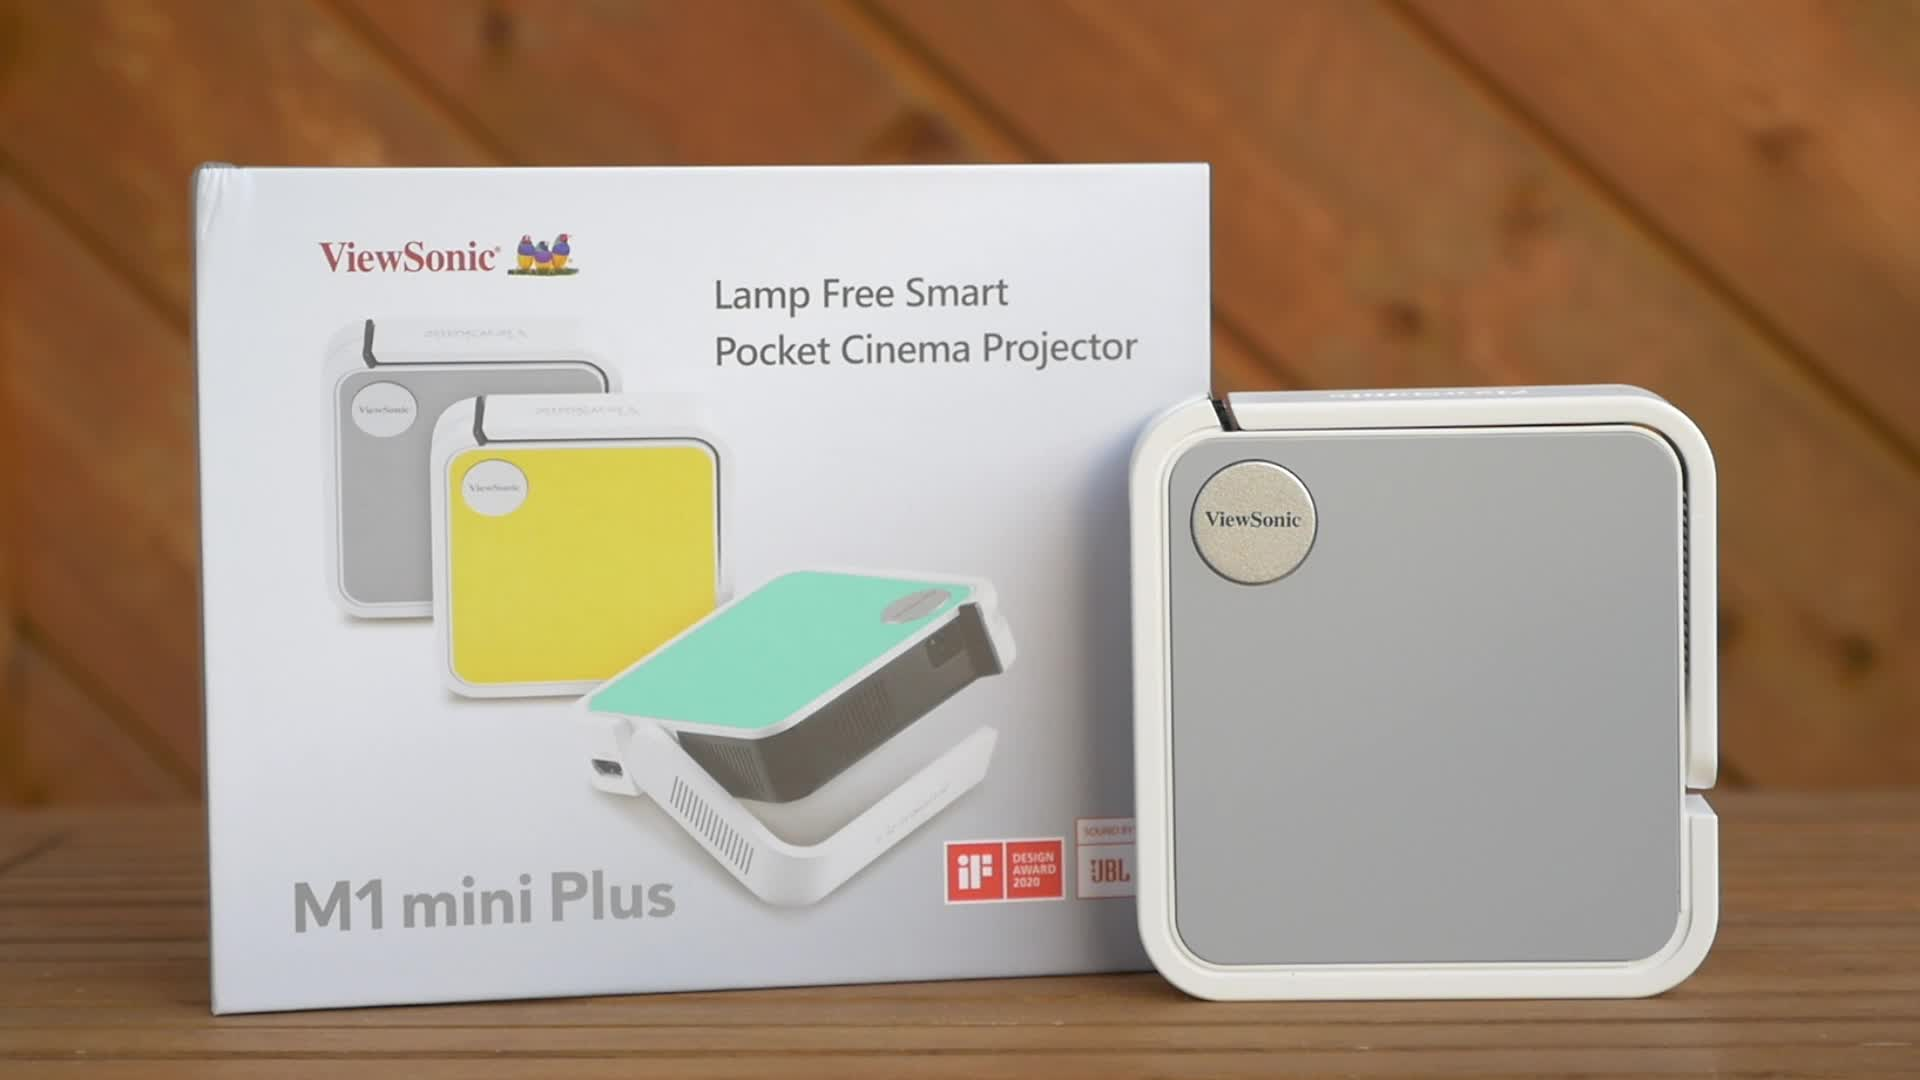 Android, Test, Kino, Mobile, Timm Mohn, Beamer, Viewsonic, M1 Mini Plus